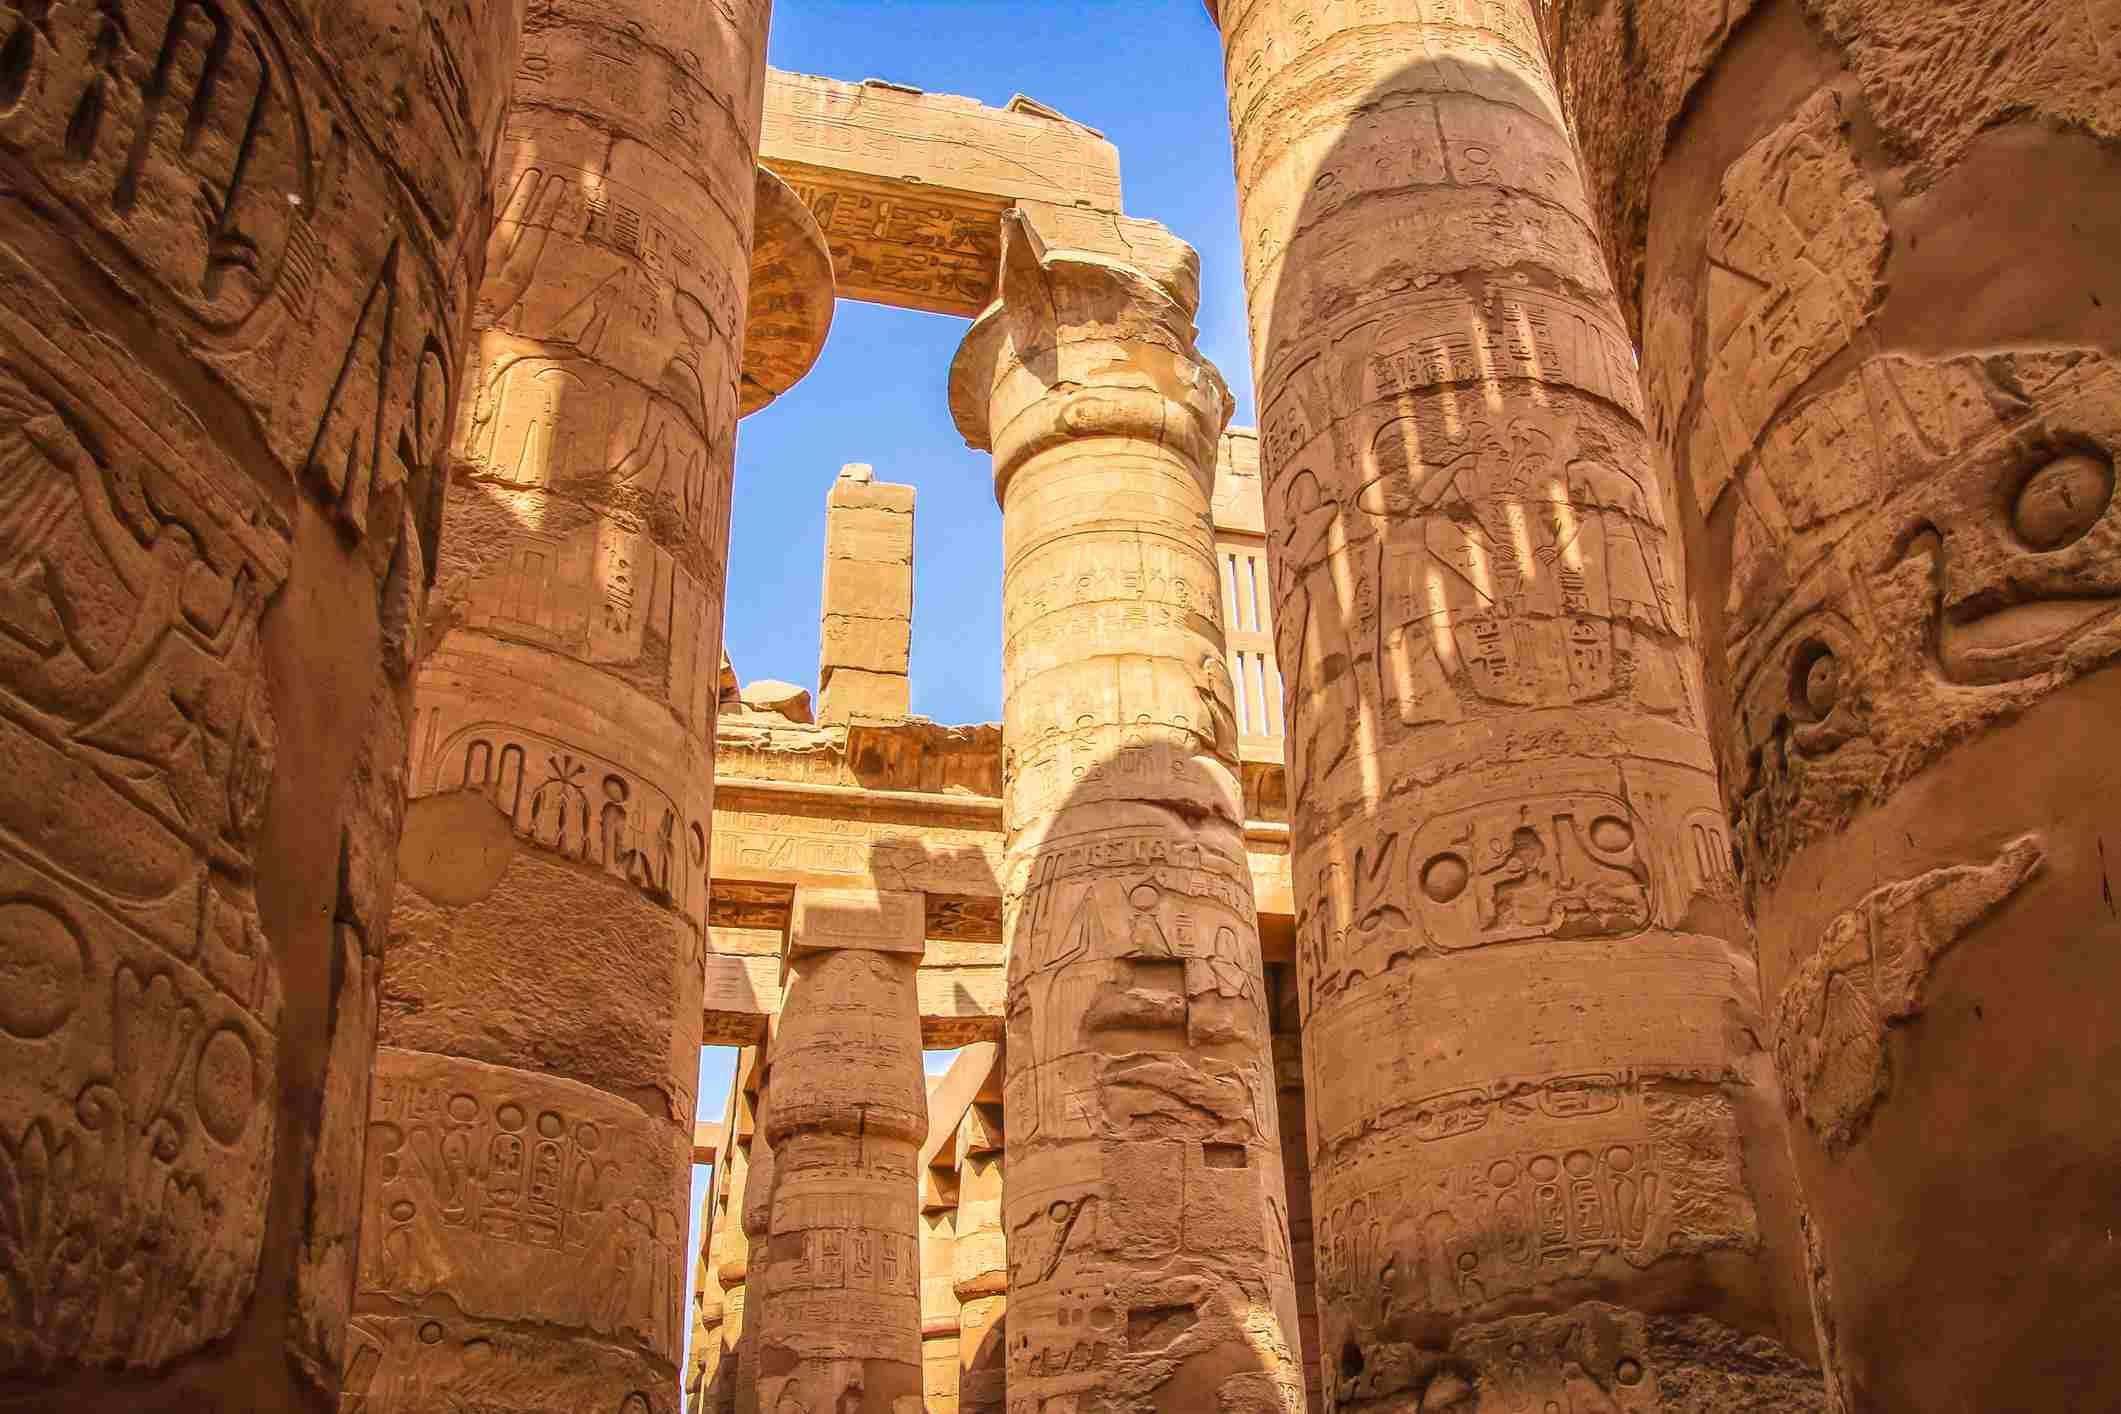 Temple of Amun-Ra, Karnak, Egypt